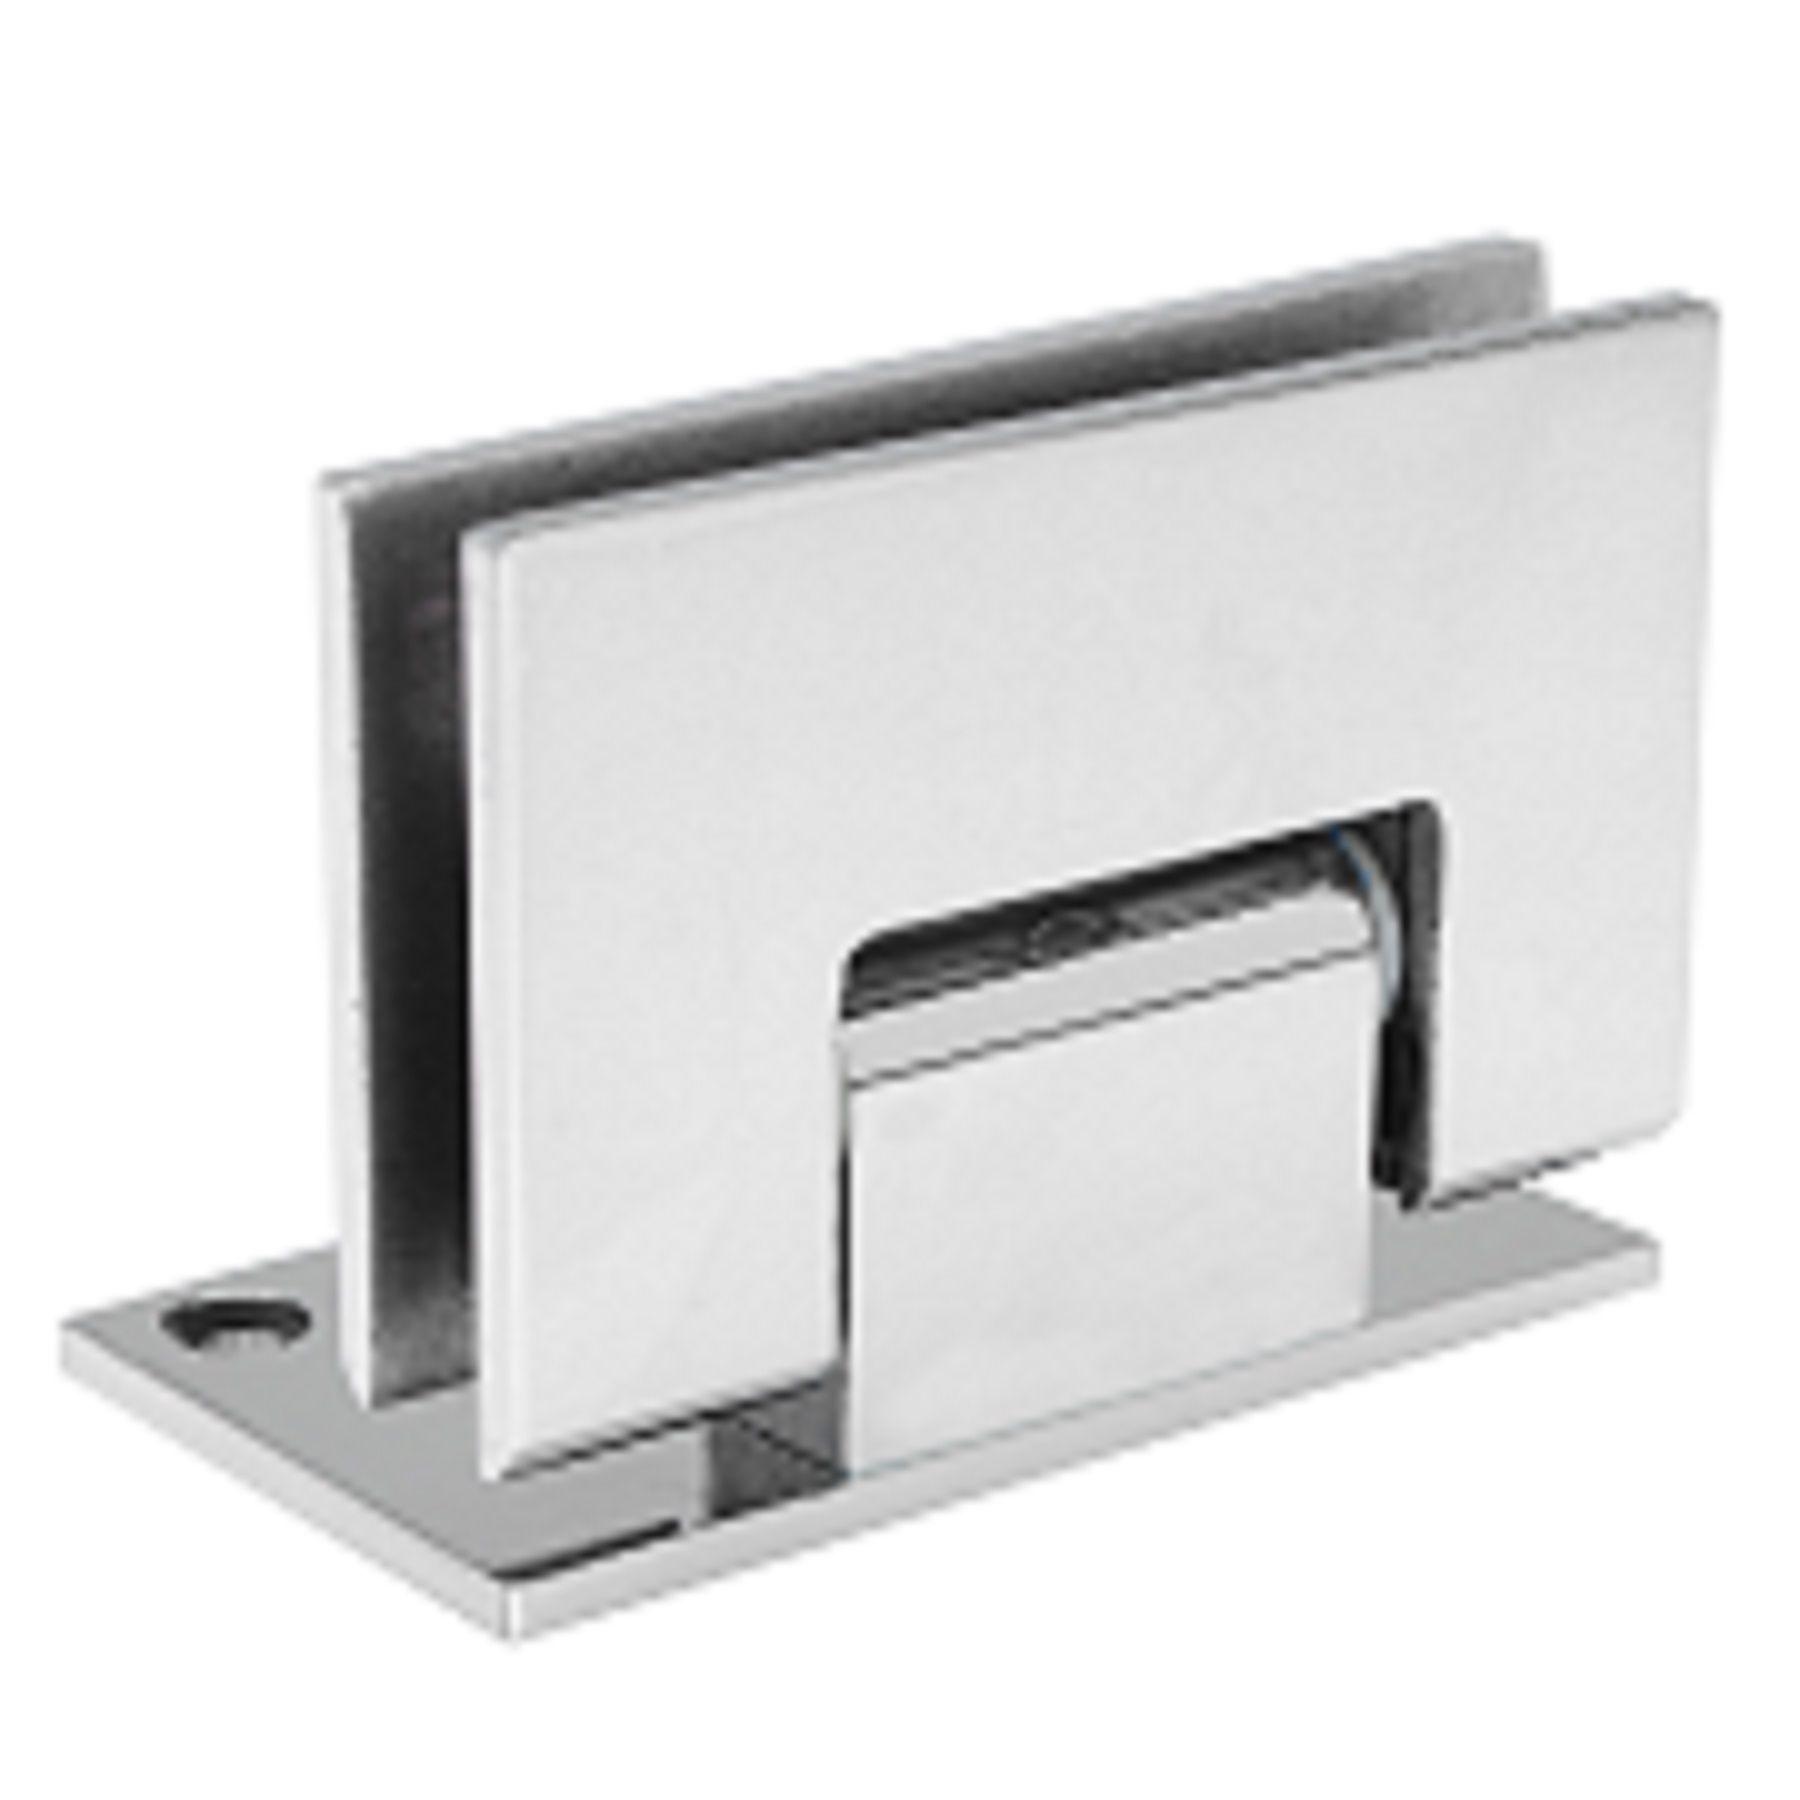 Dobradiça inox GV48 90º 1011 para porta de vidro e box - alvenaria/vidro 2 un